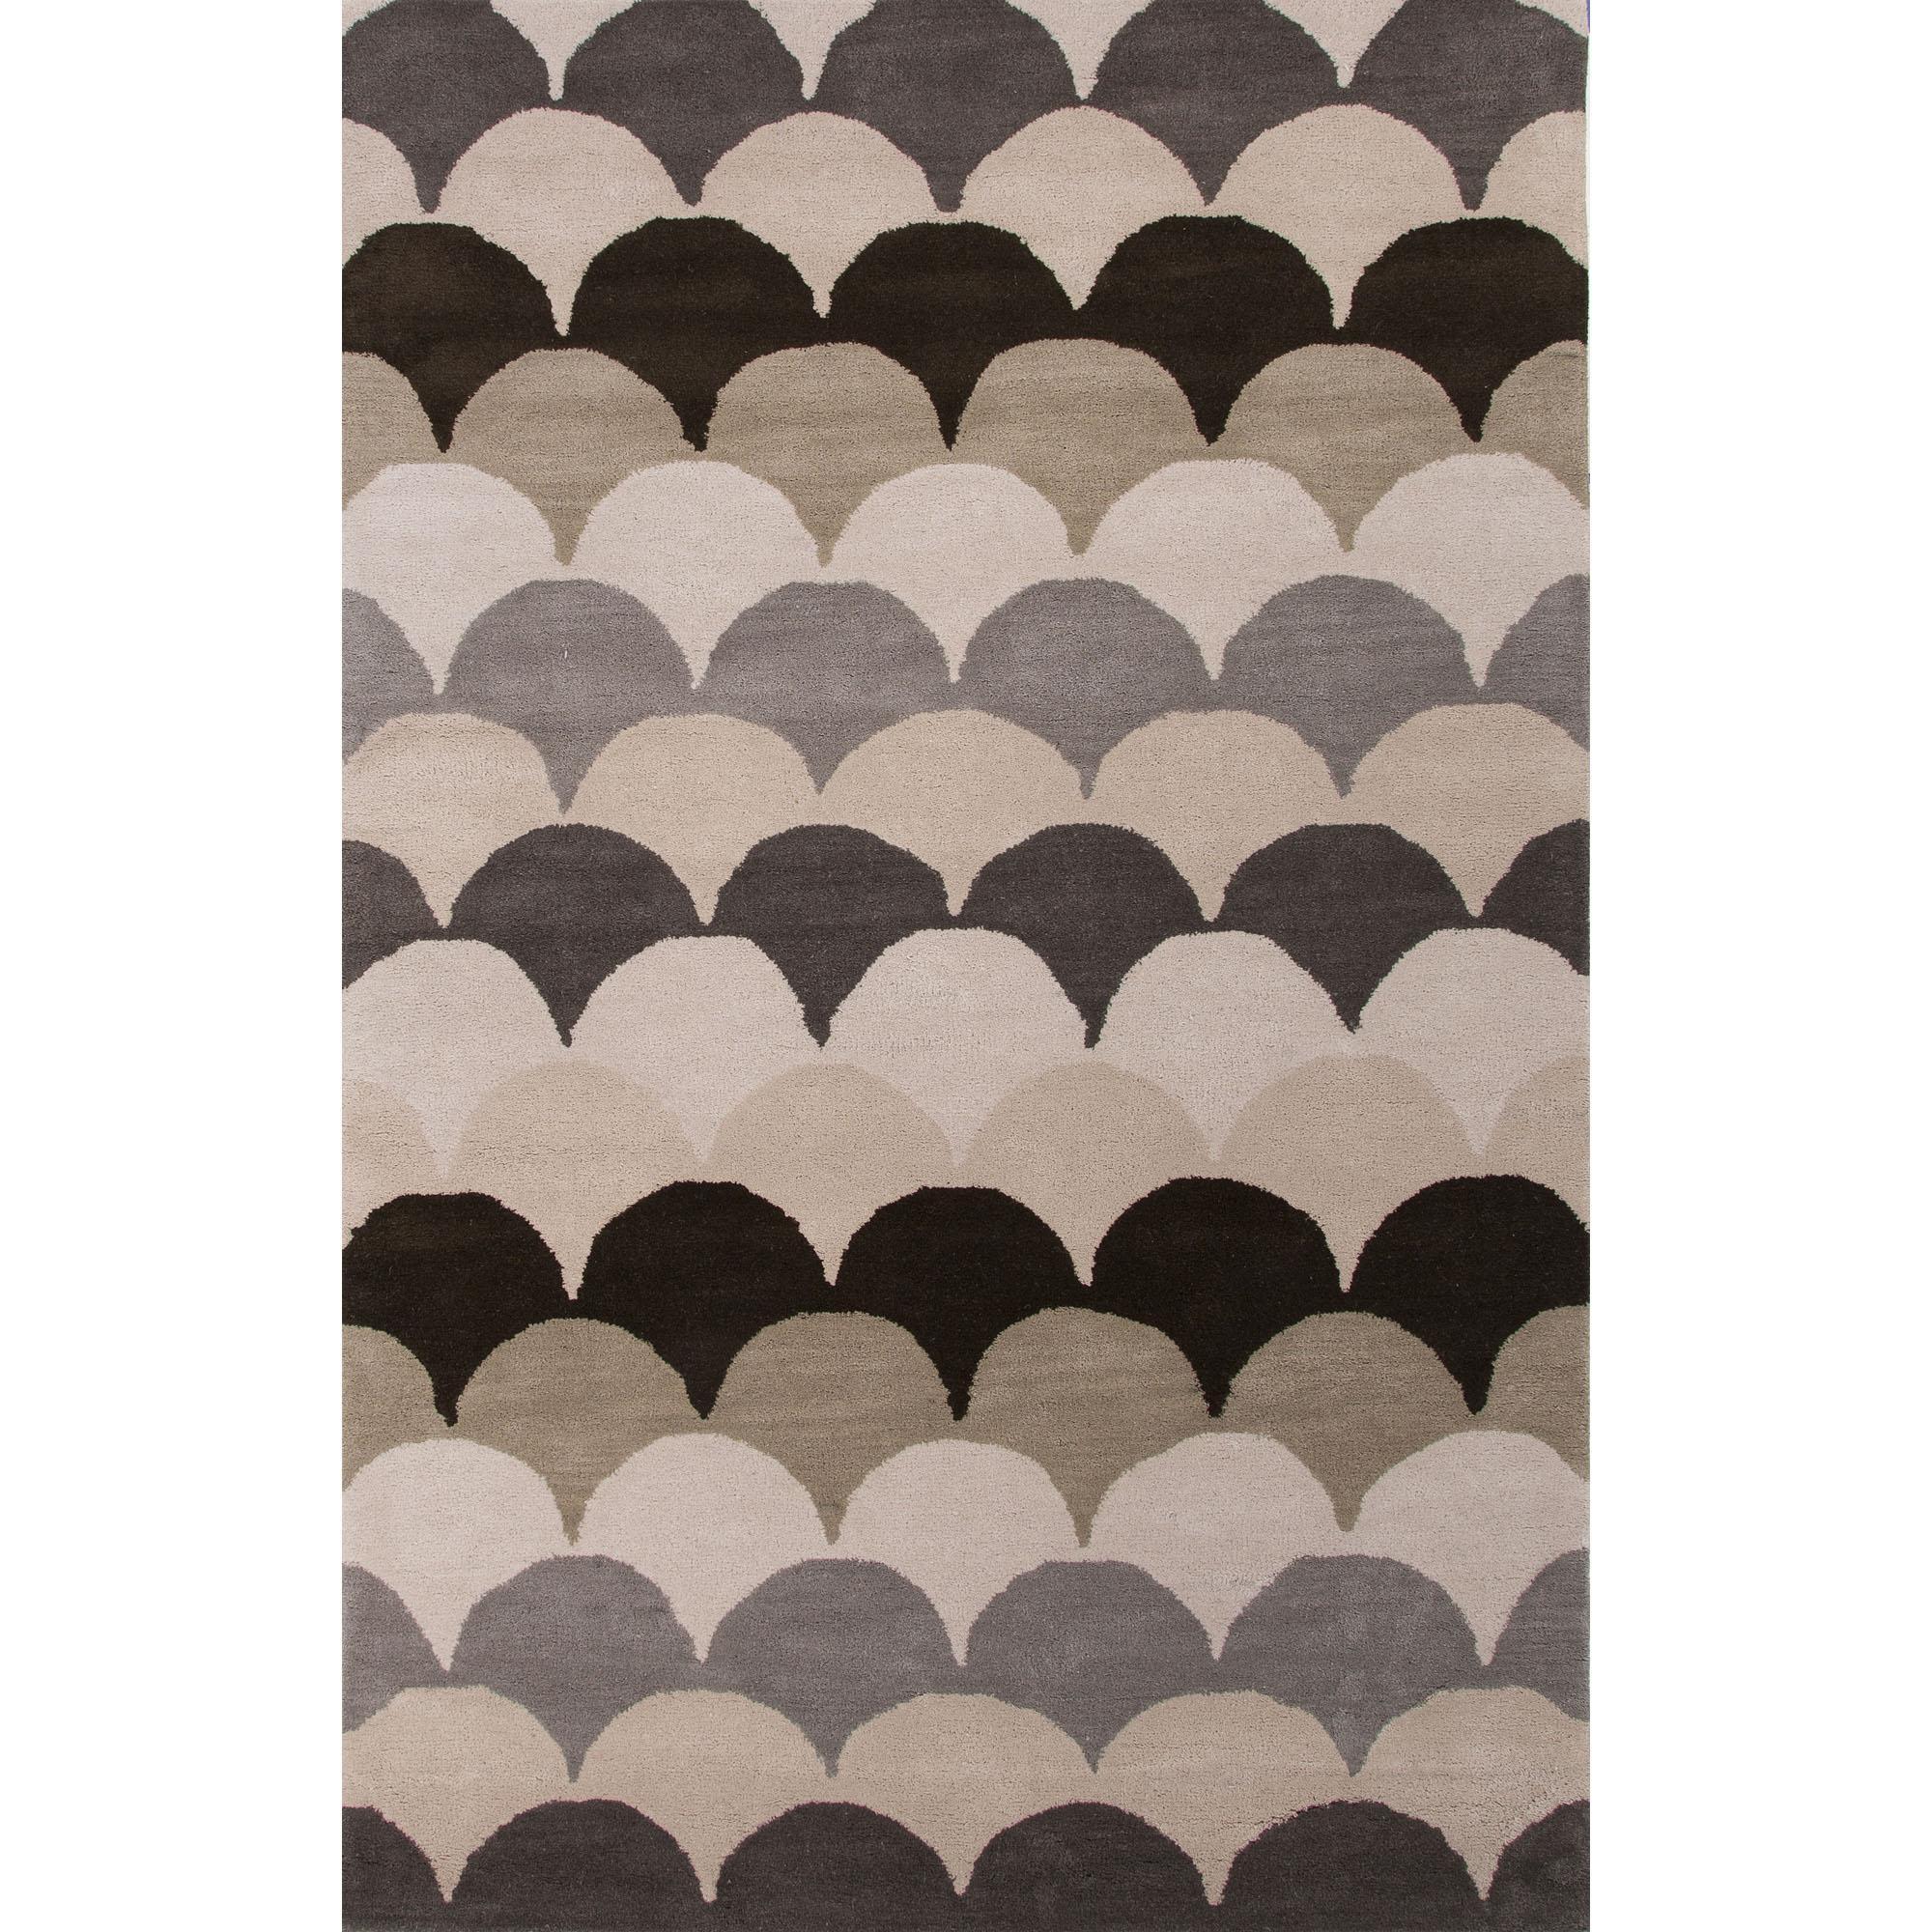 JAIPUR Rugs En Casa By Luli Sanchez Tufted 2 x 3 Rug - Item Number: RUG116776